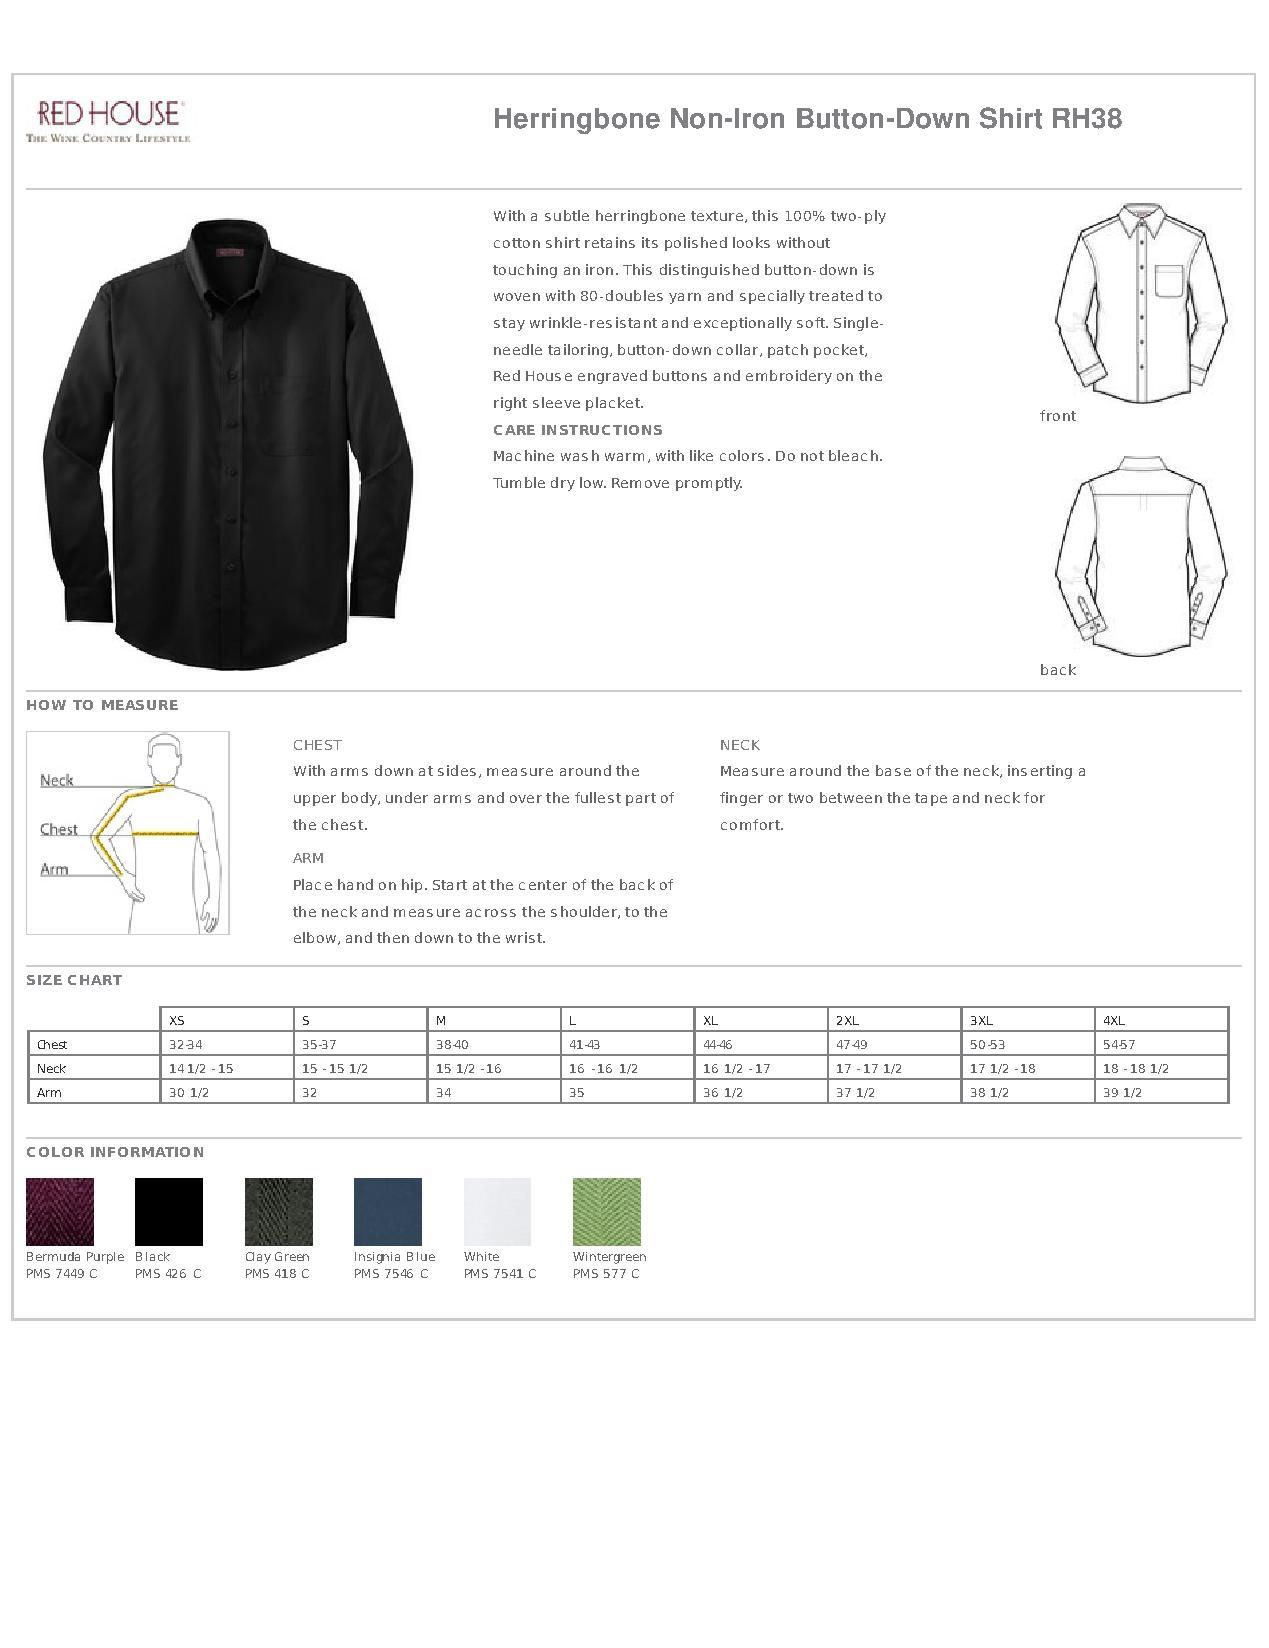 e876f8b6 Red House® RH38 Herringbone Non-Iron Button-Down Shirt - Woven Shirts